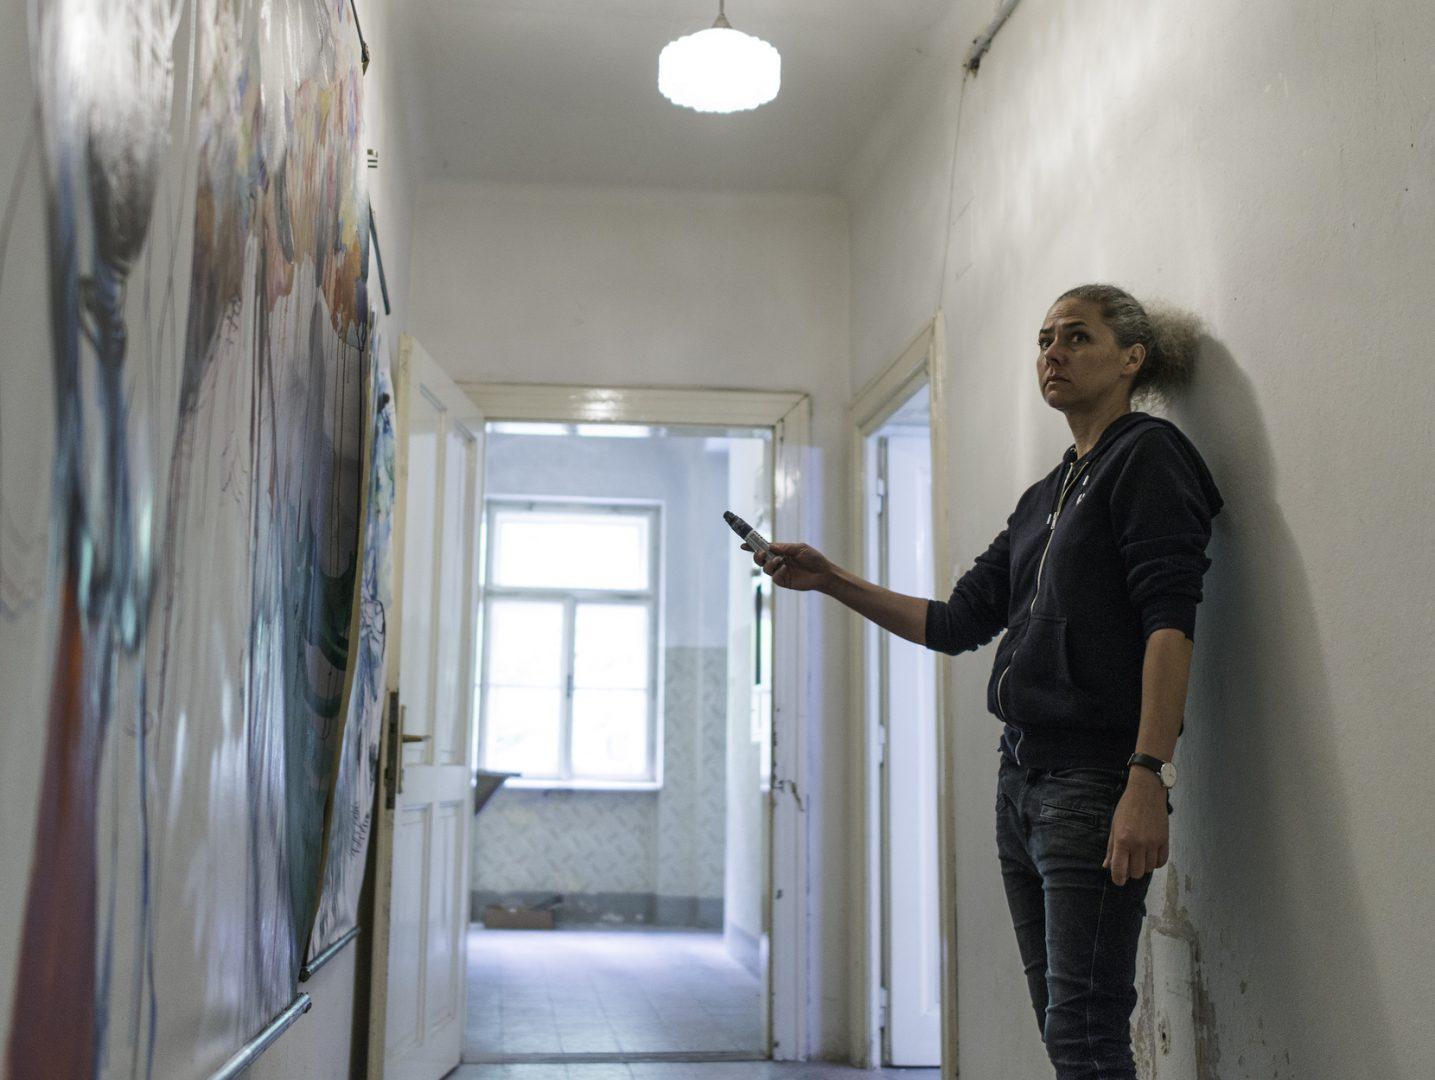 Helga Schmidhuber, Atelieransicht, SommerFrischeKunst, 2017, Photo credit: Holger Schmidhuber